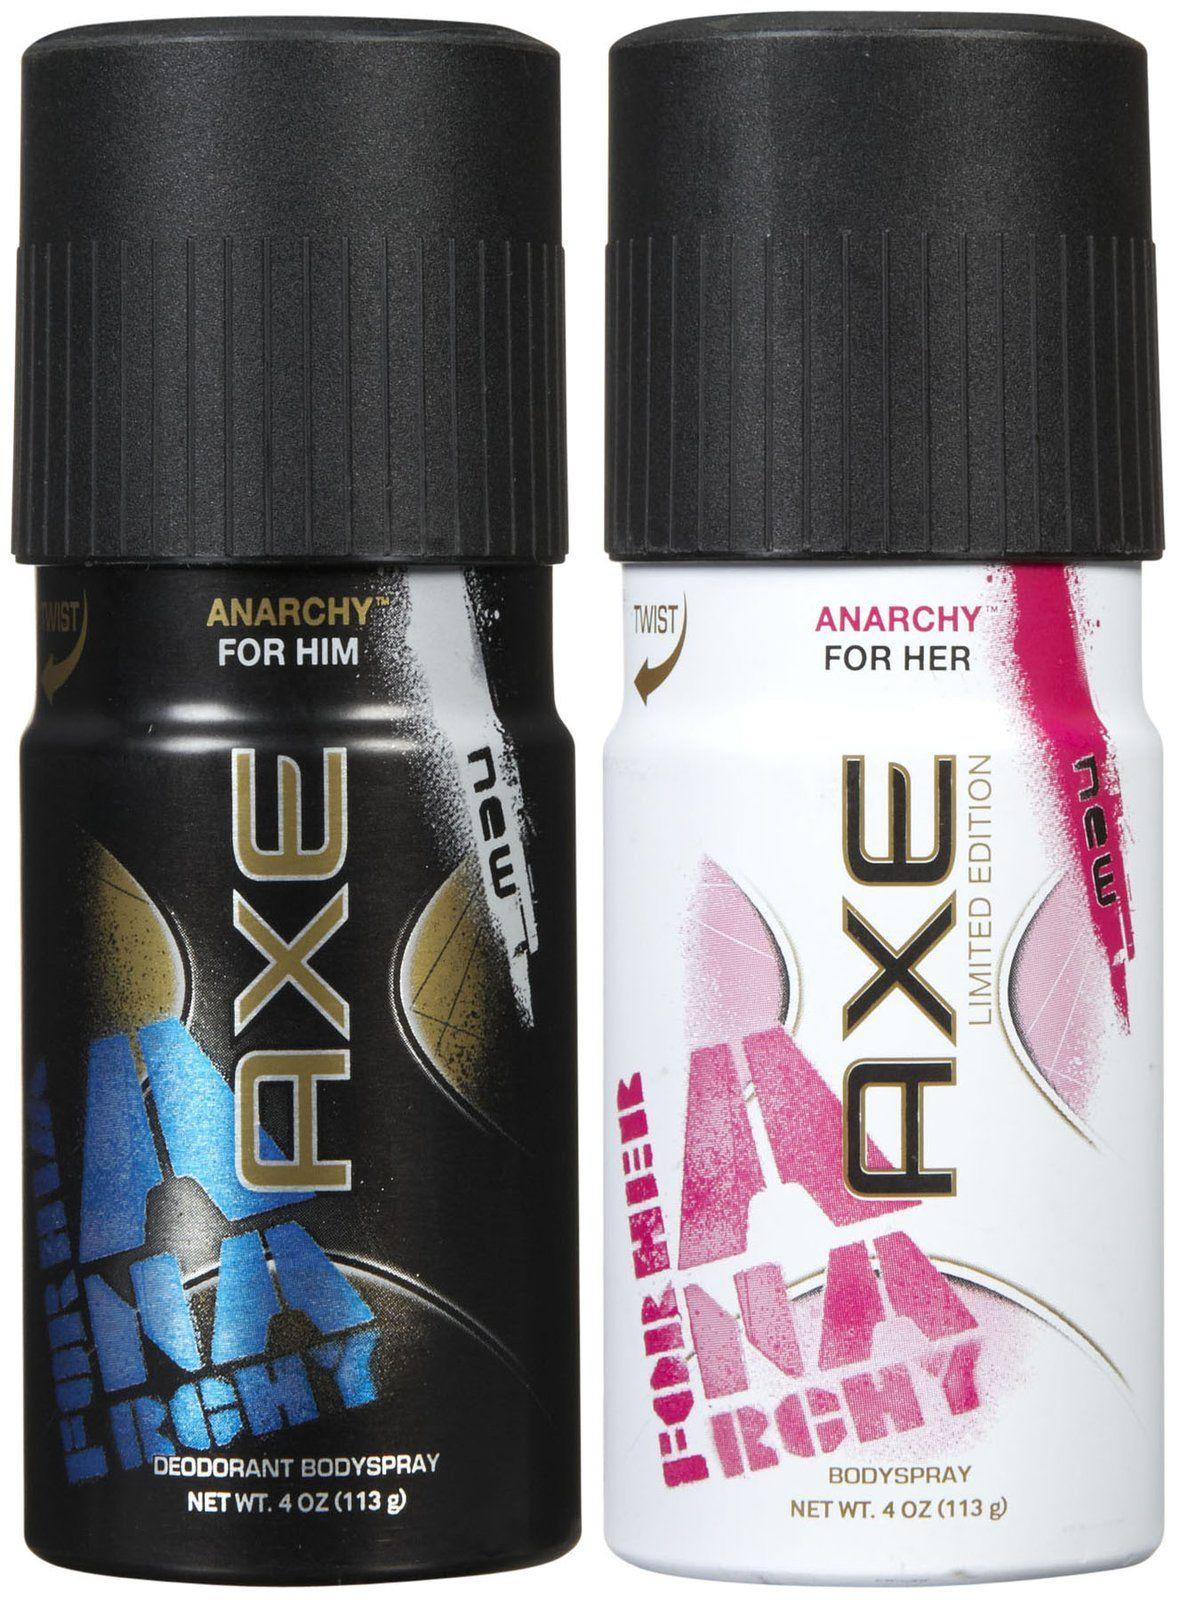 Axe Anarchy Deodorant Body Spray For Him For Her Bundle Body Spray Deodorant Axe Anarchy